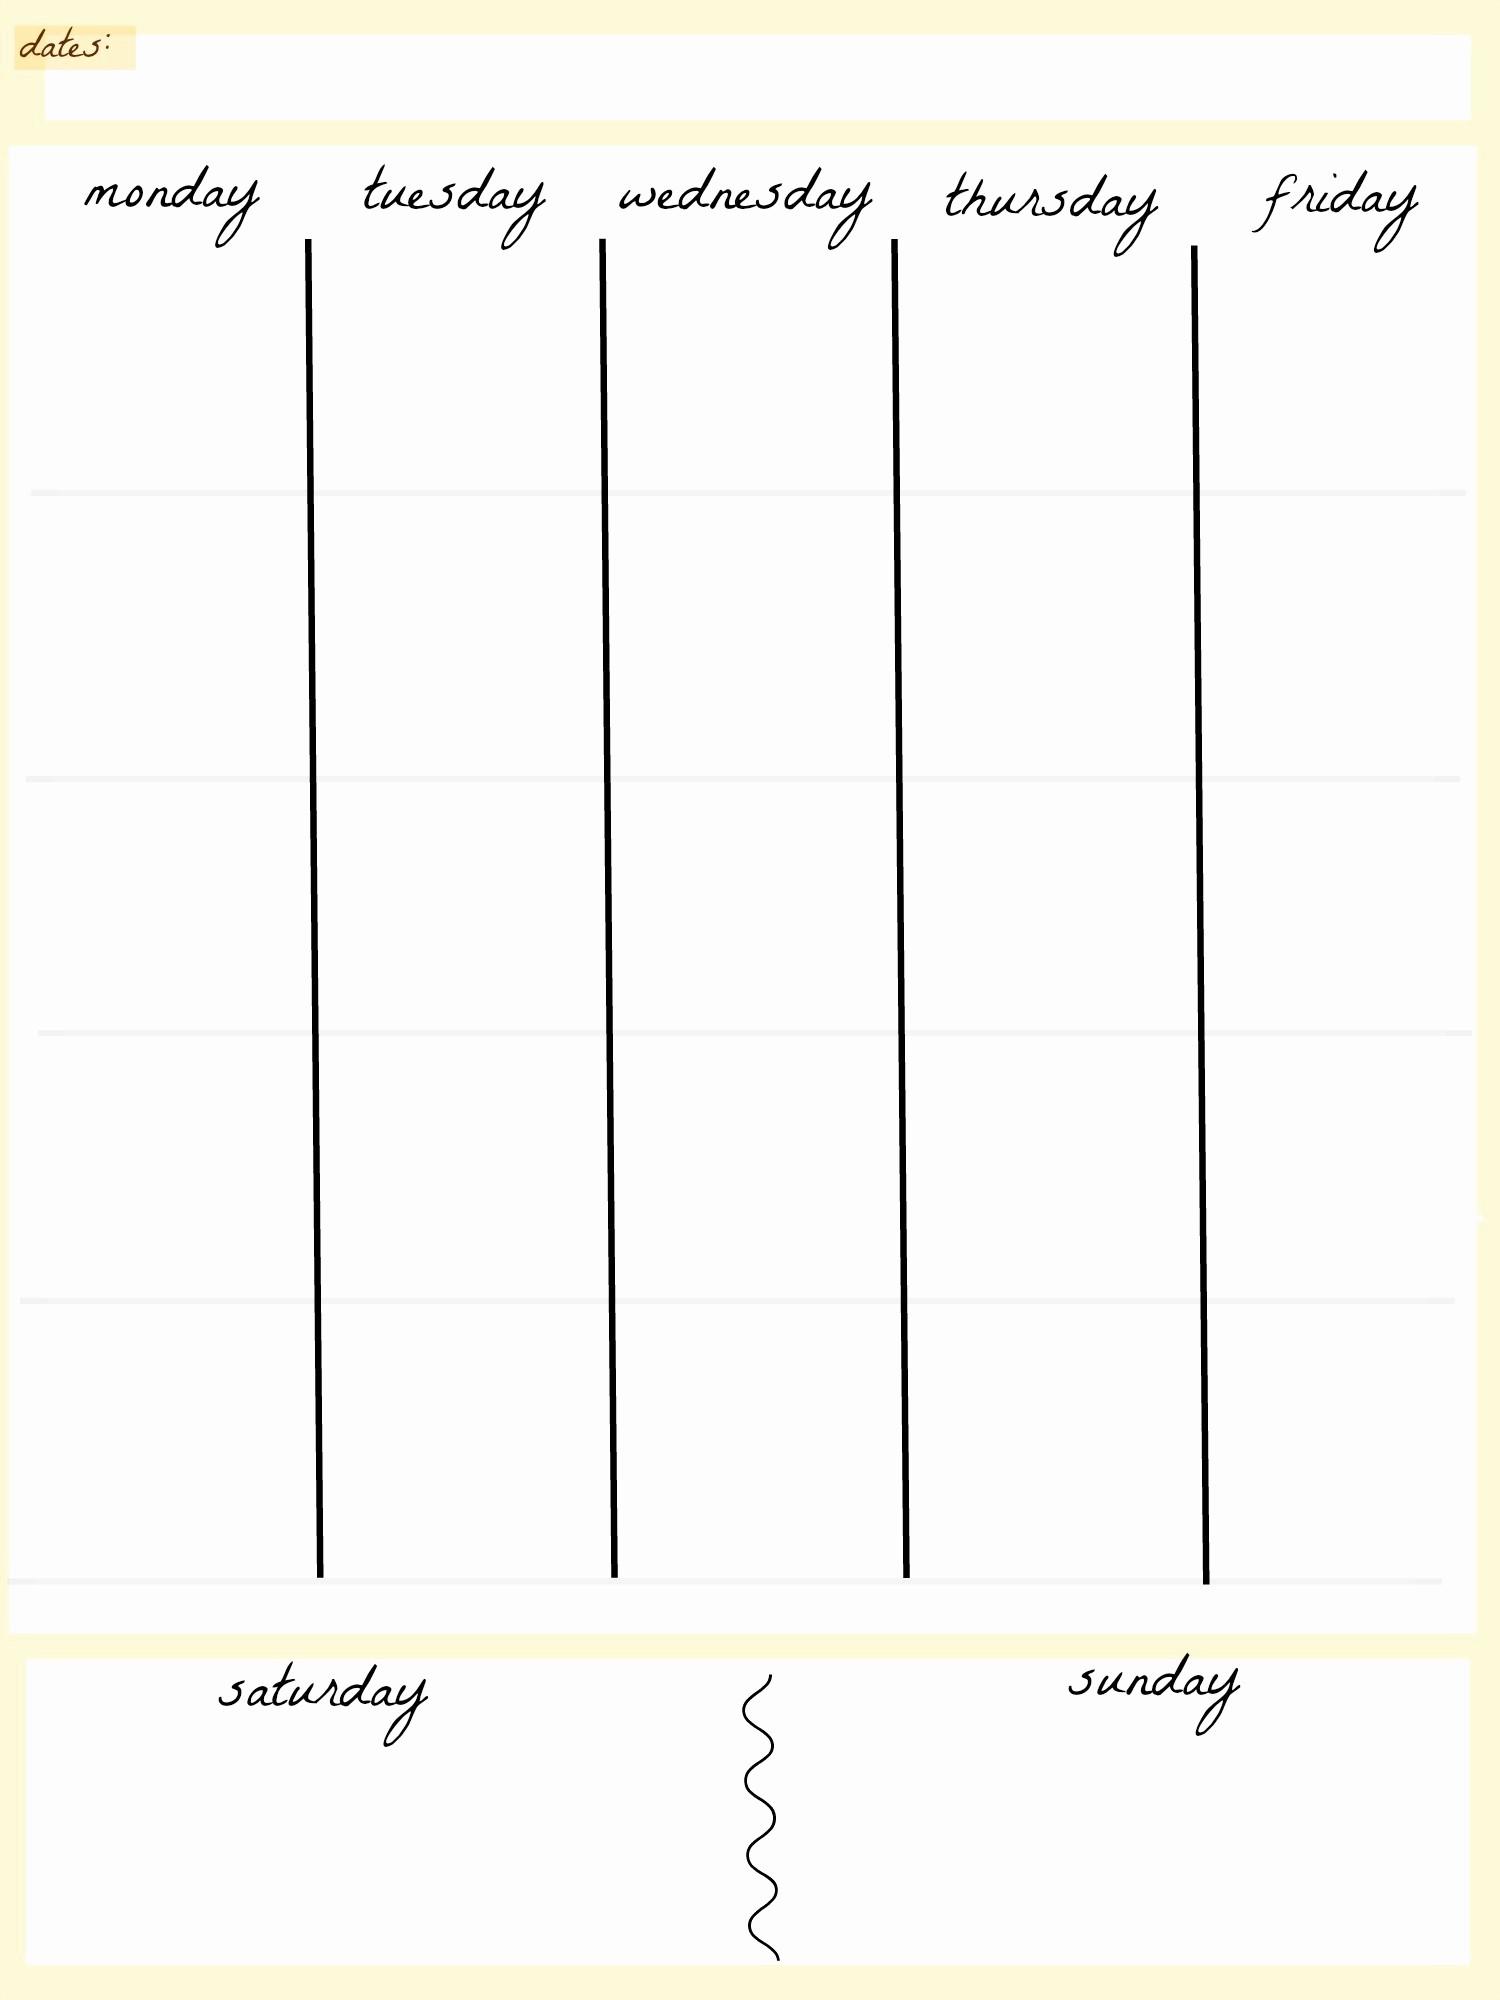 5 Day Weekly Calendar Template Elegant 5 Day Work Week Monthly Calendar Printable – Calendar